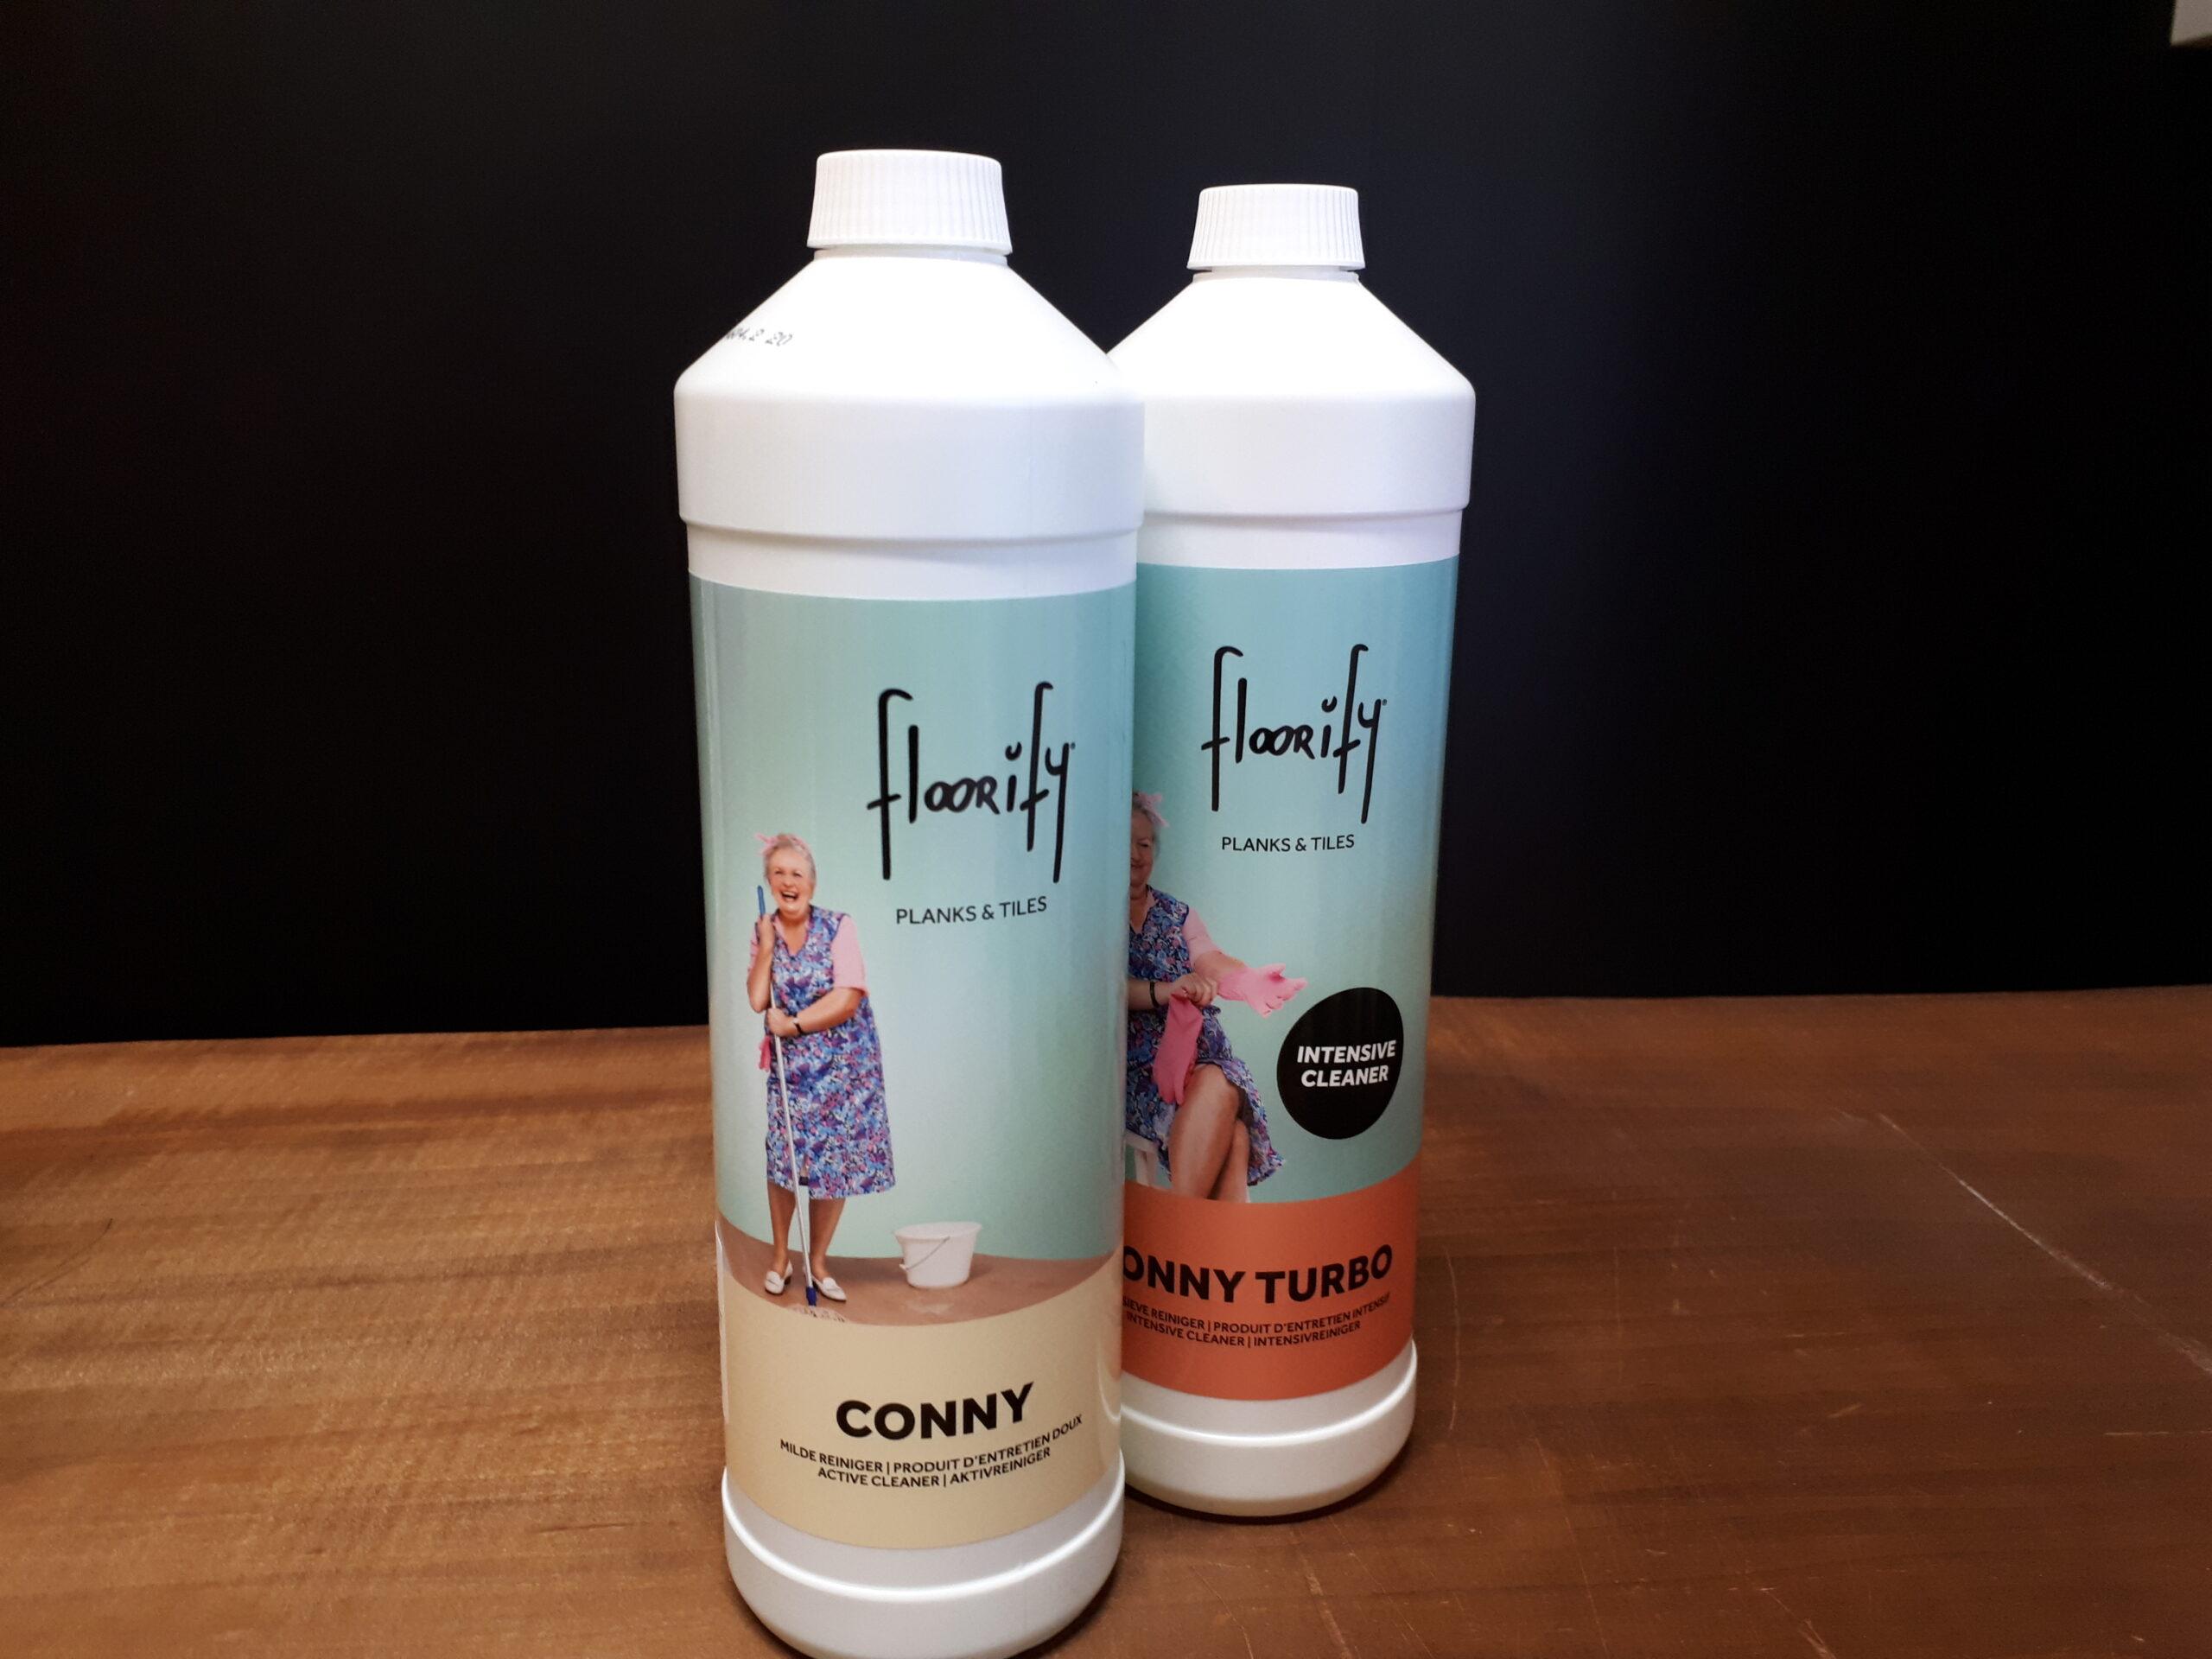 Conny Floorify